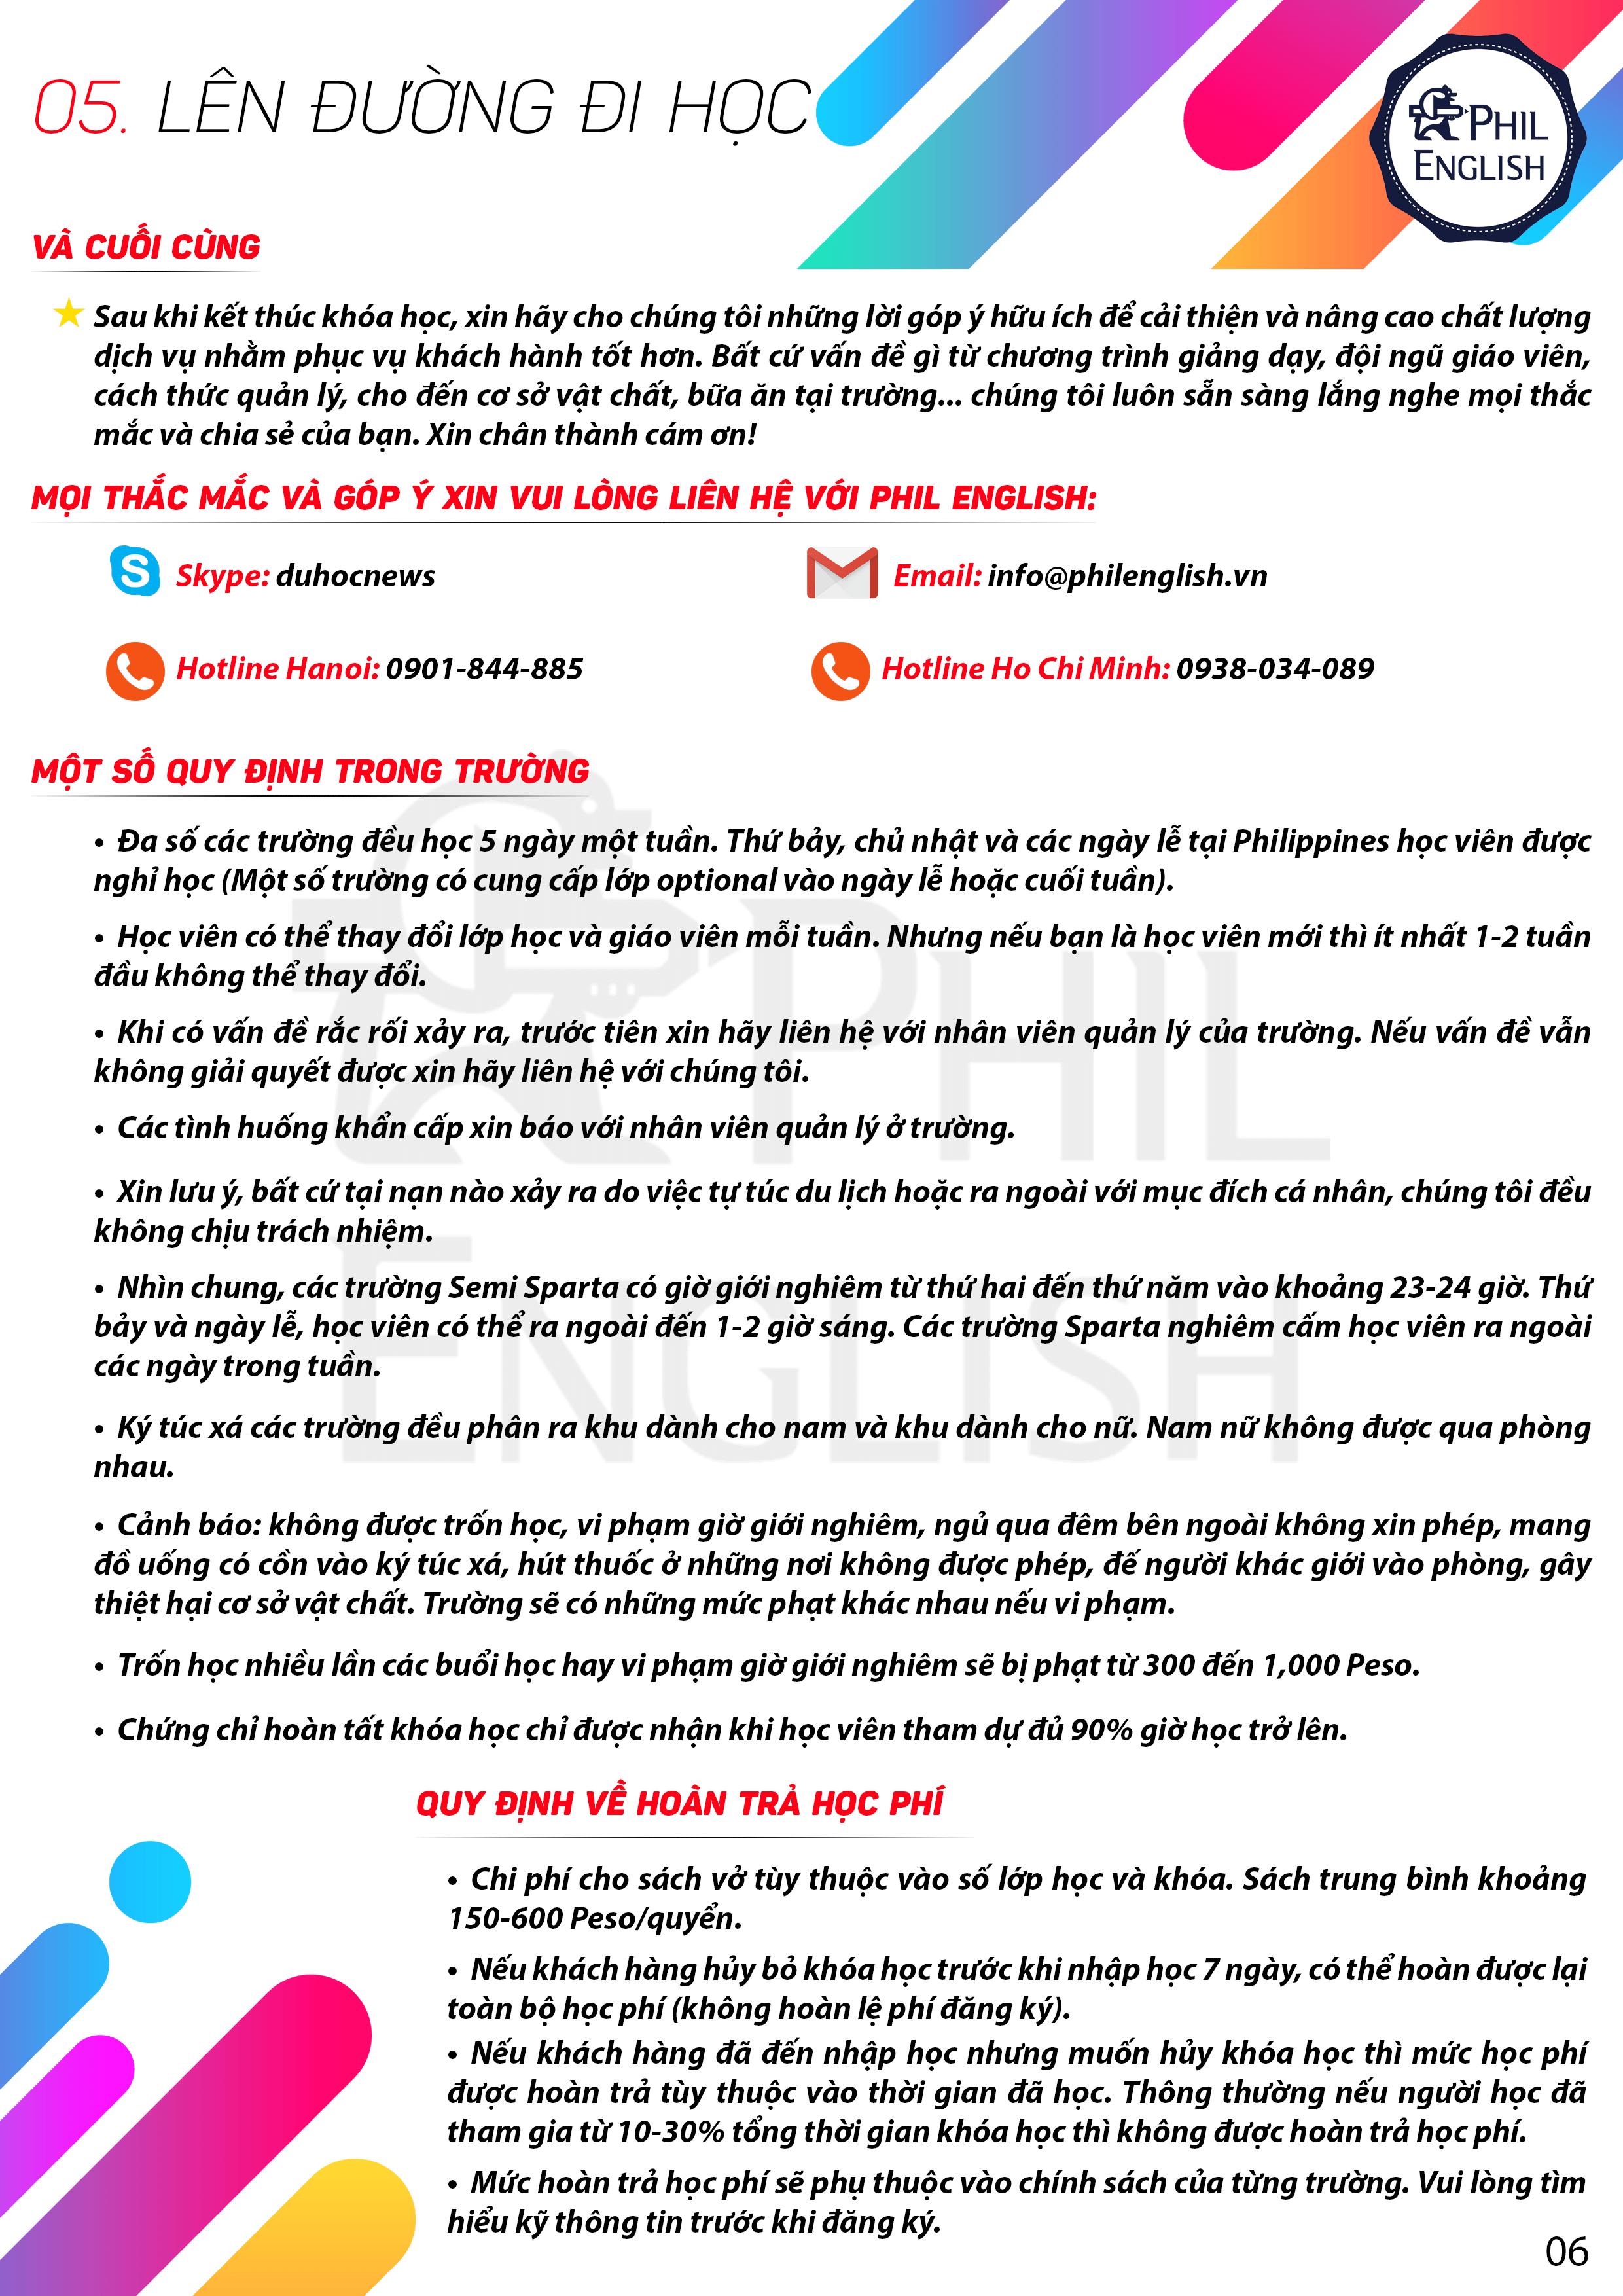 huong-dan-truoc-khi-nhap-hoc-tai-philippines-7